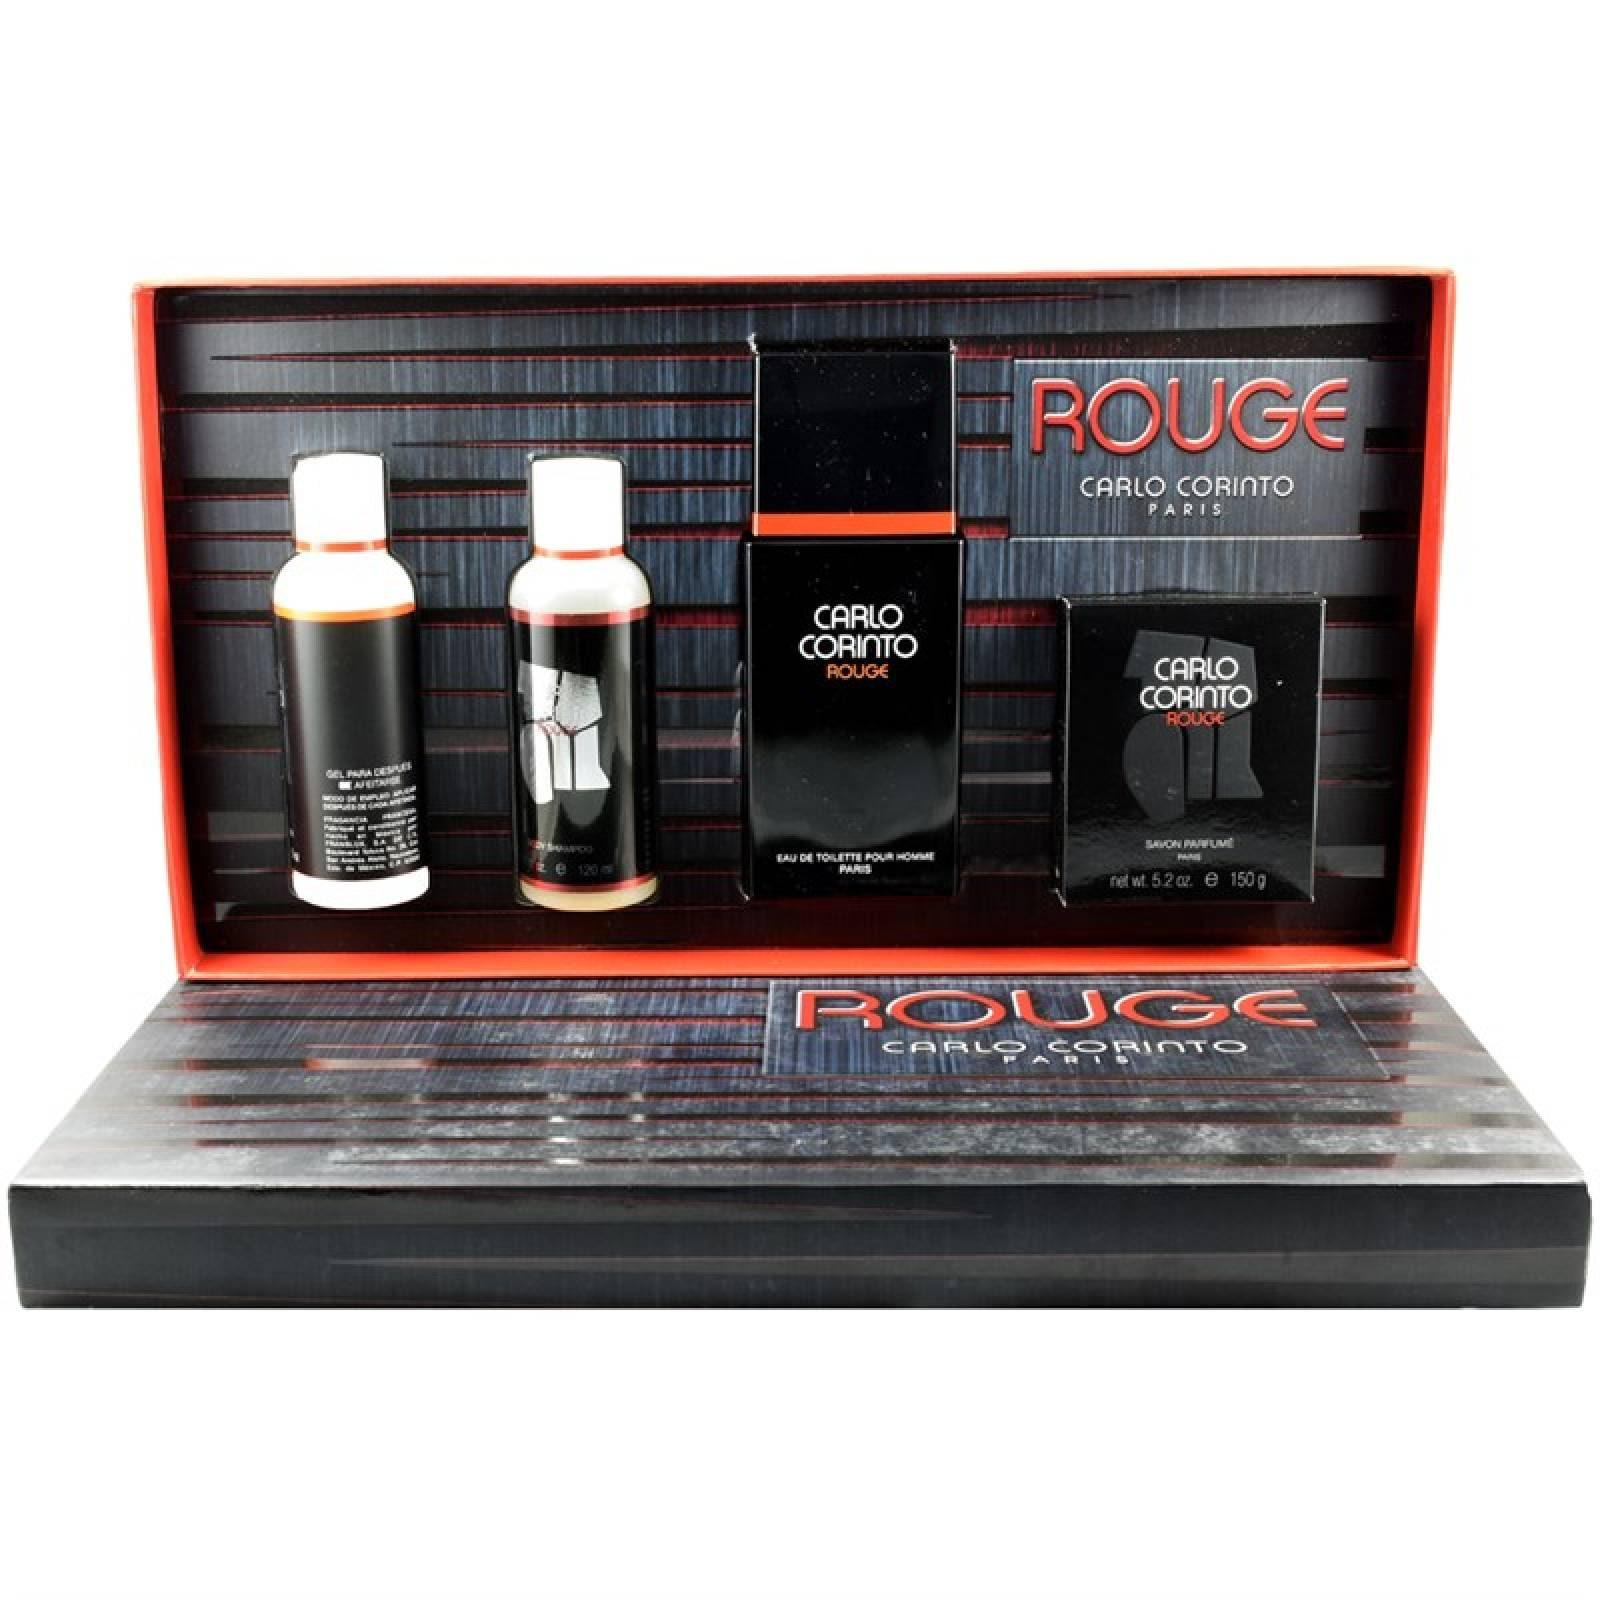 Set Carlo Corinto Rouge 4Pzs 100 Ml Edt Spray +Jabon 150G + Shower Gel 120 Ml + After Shave 120 Ml De Carlo Corinto de Caballero